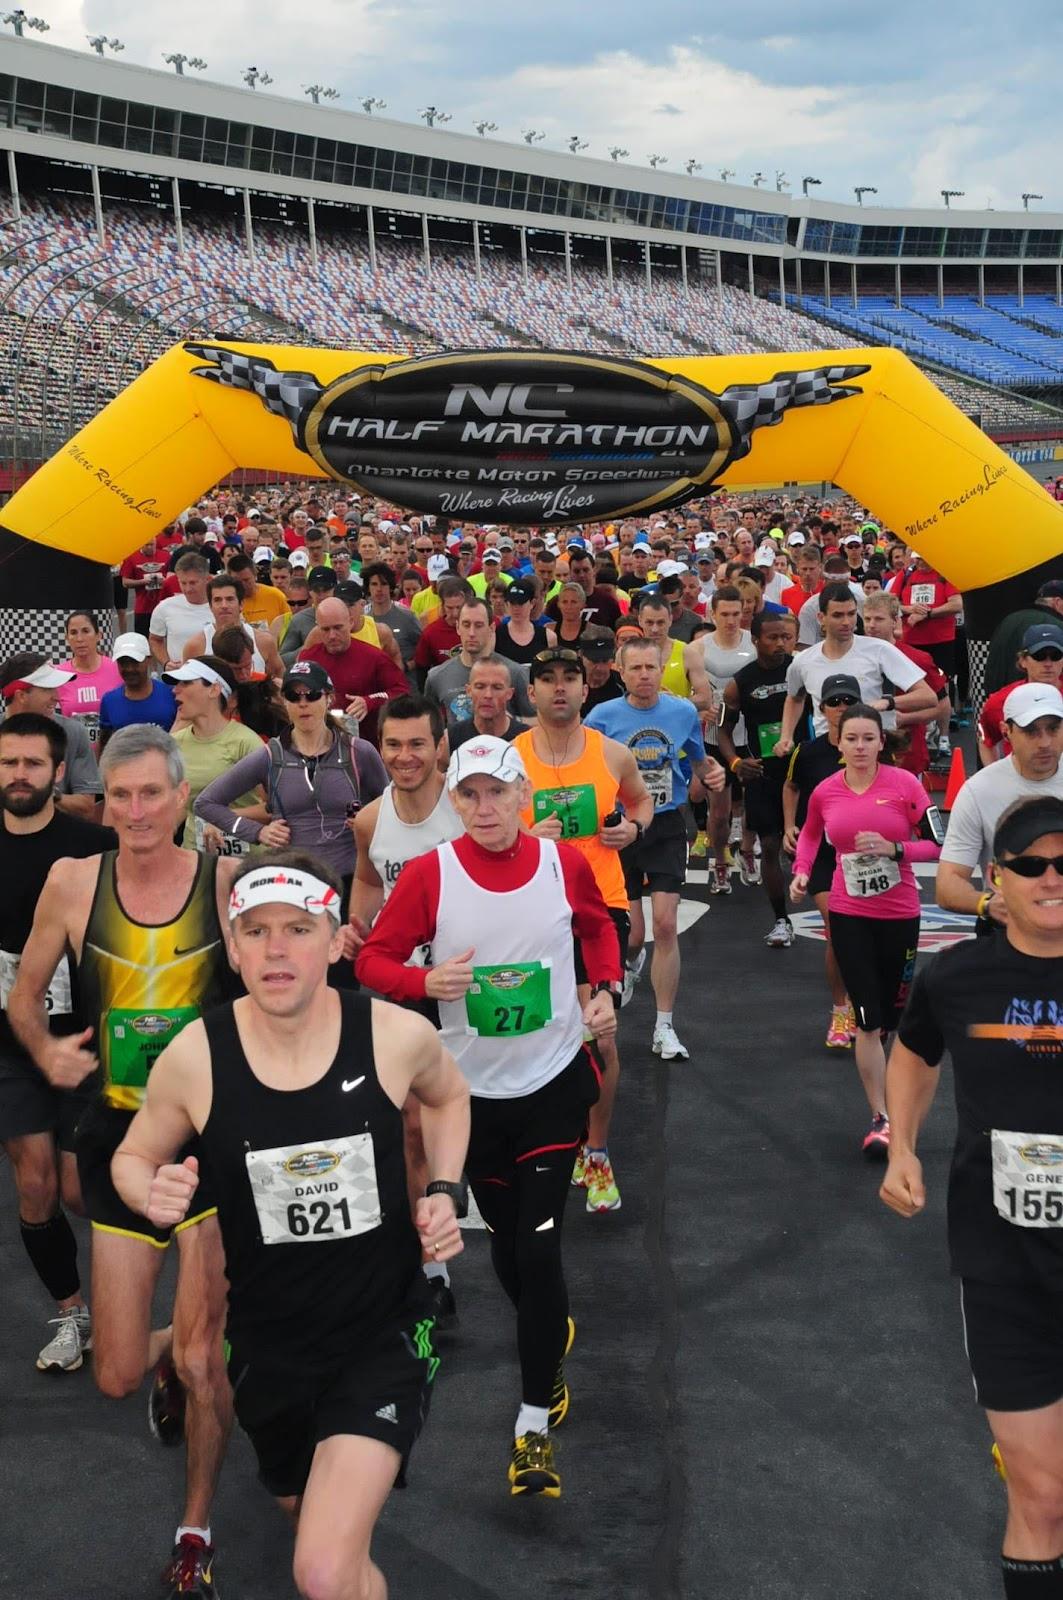 race 168 nc half marathon at charlotte motor speedway